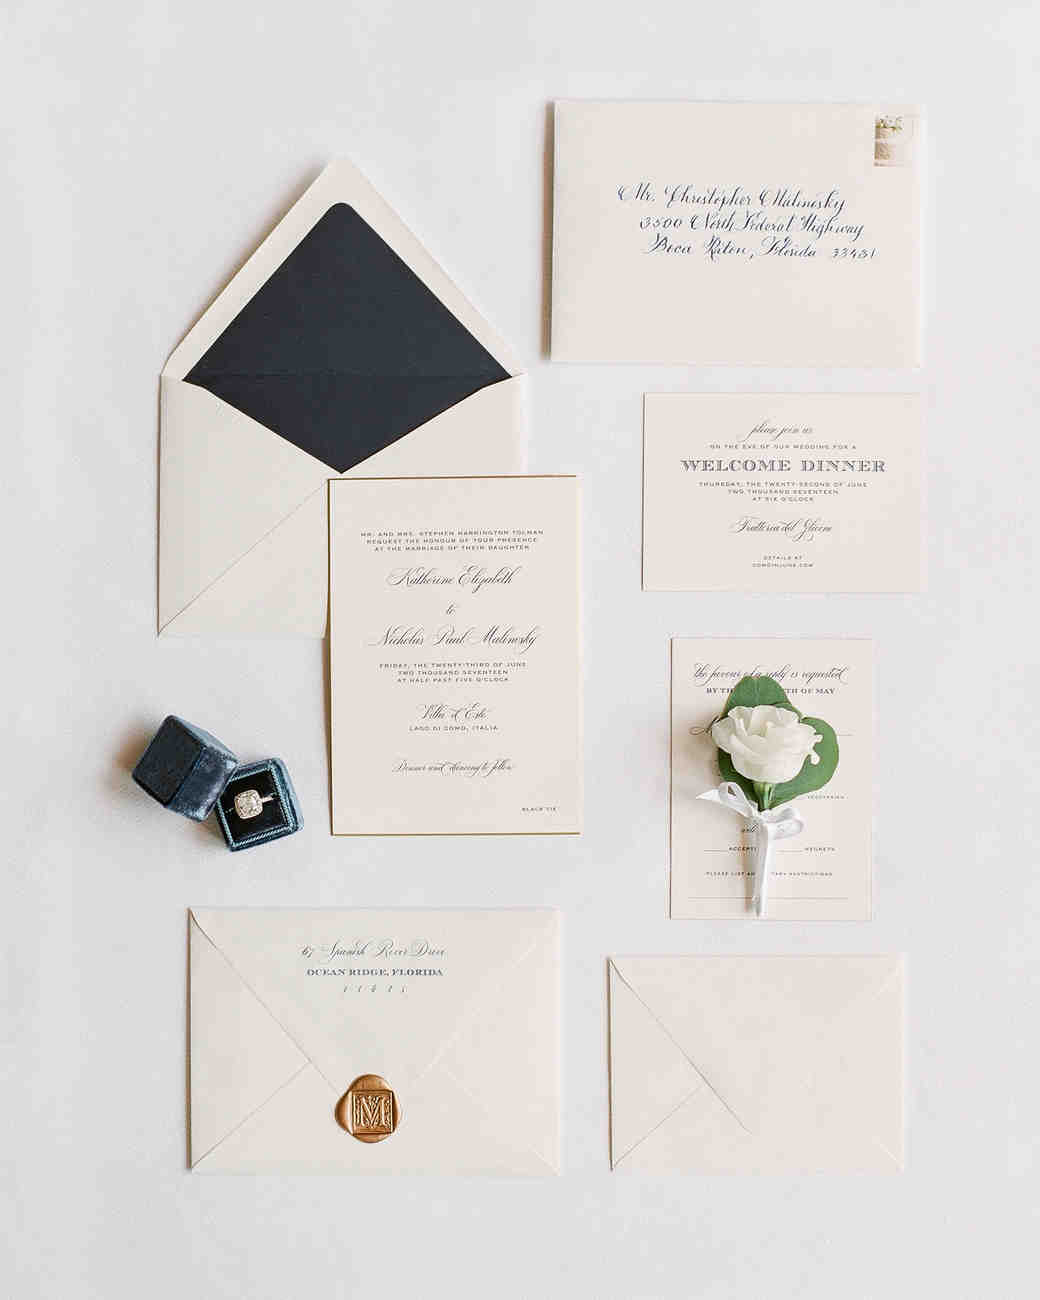 Gorgeous Wedding Invitations With Wax Seals Martha Stewart Weddings